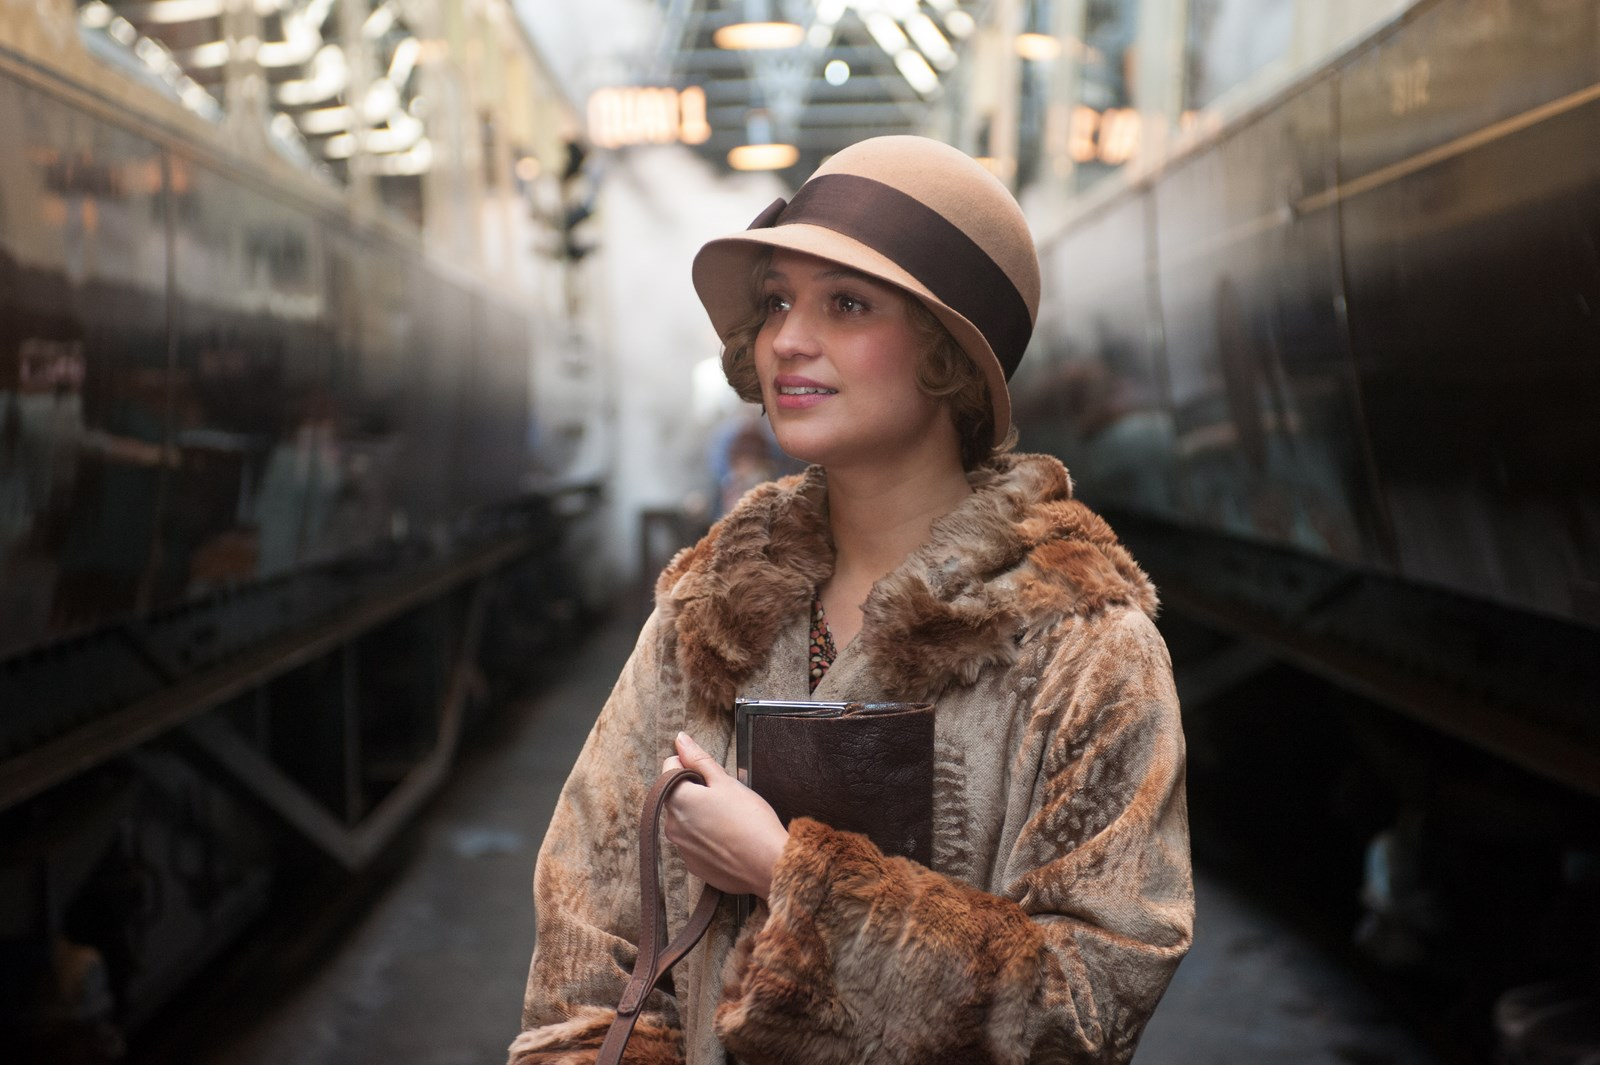 The Danish Girl - Alicia Vikander